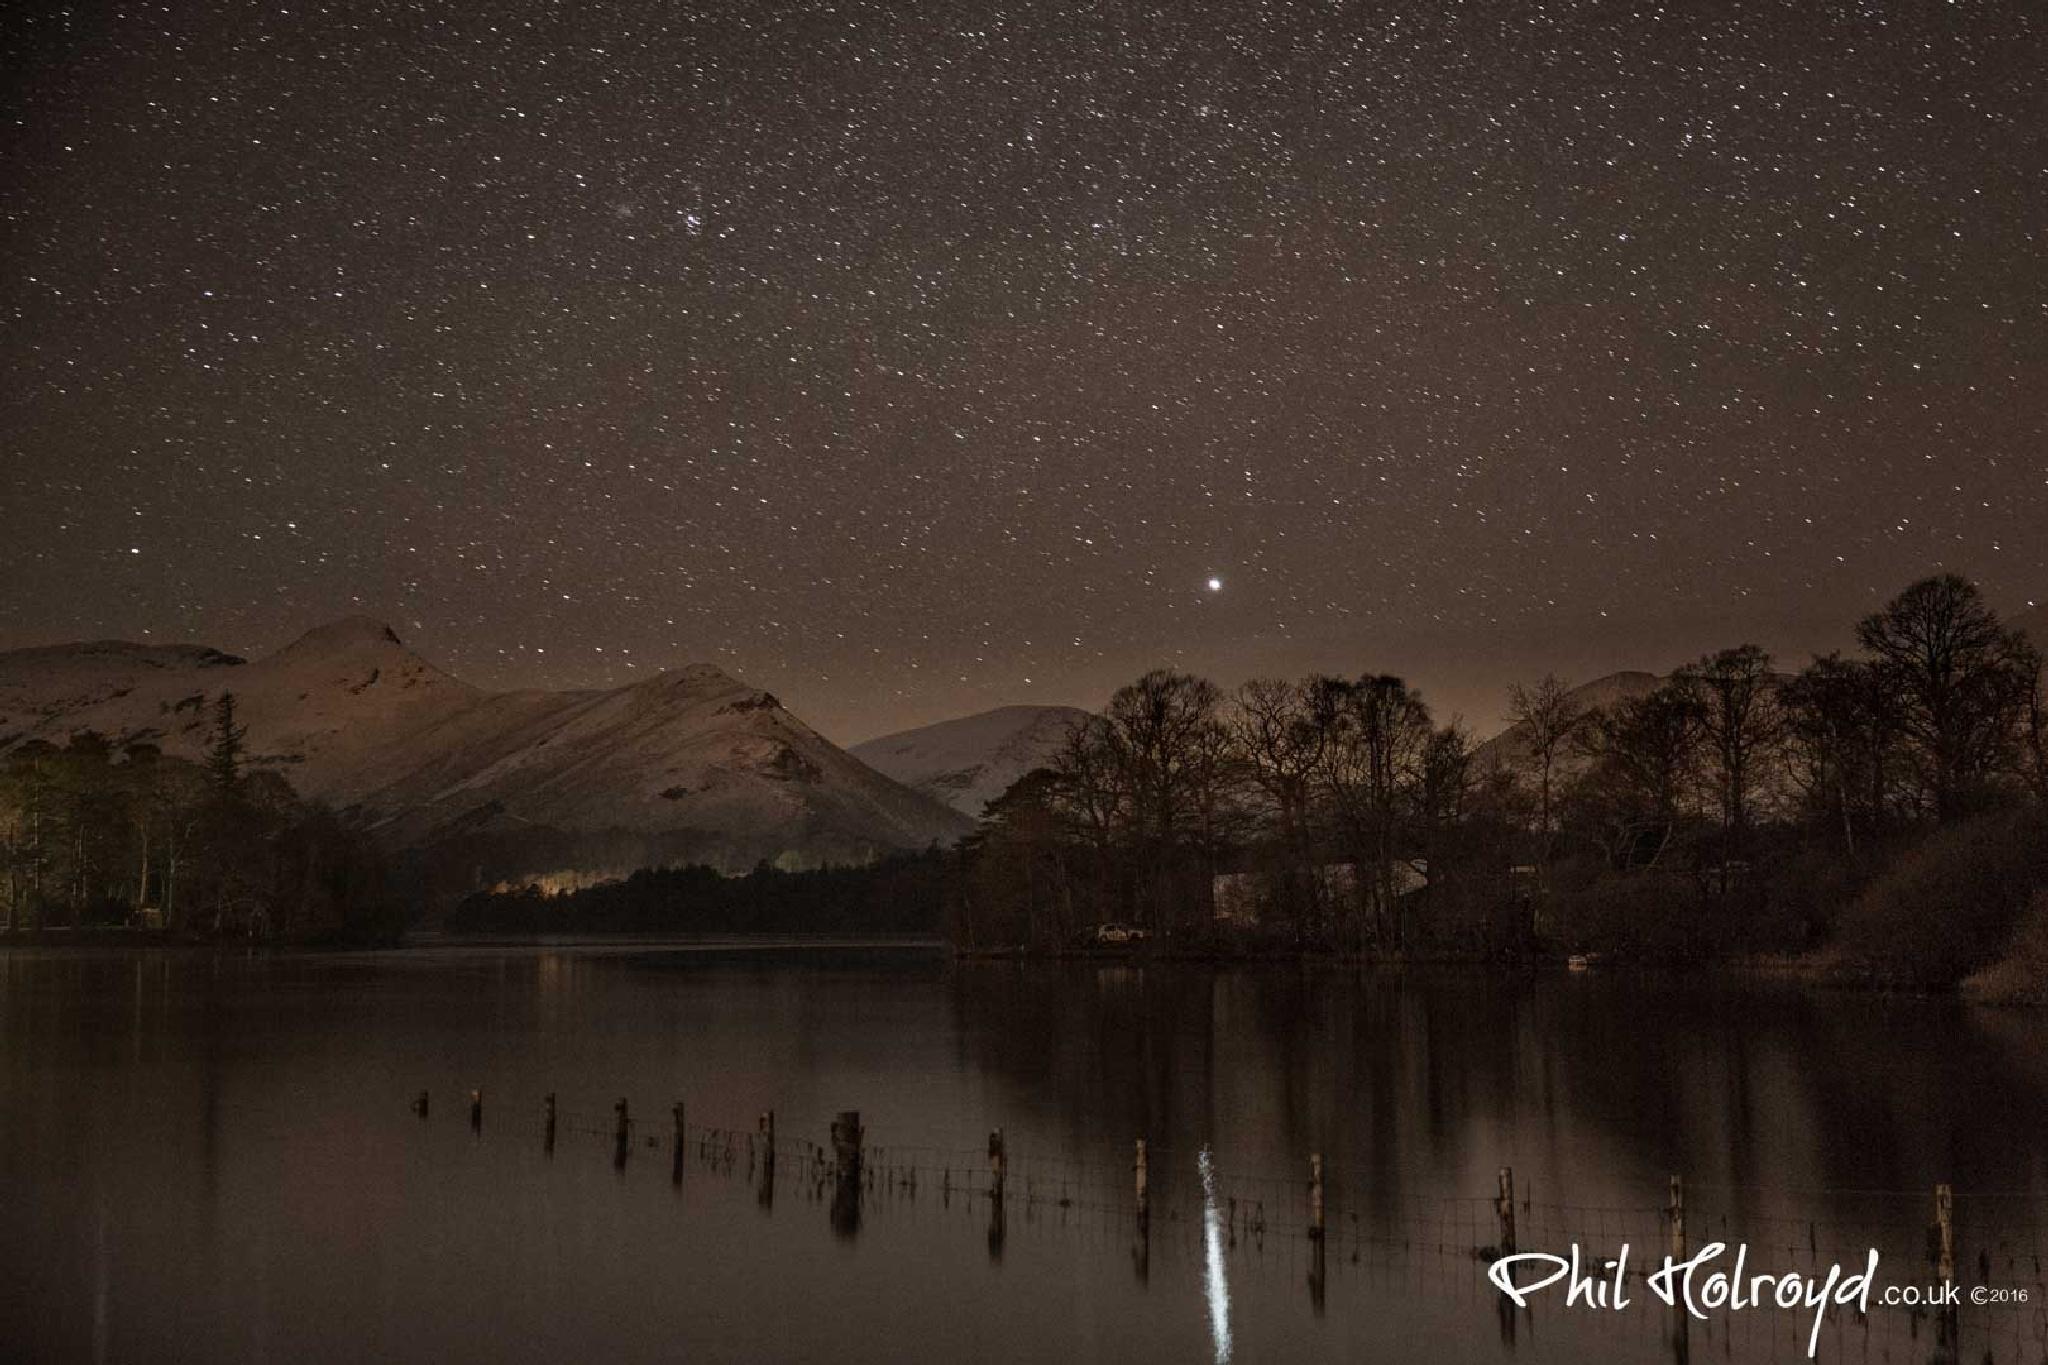 Catbells Stars by Phil